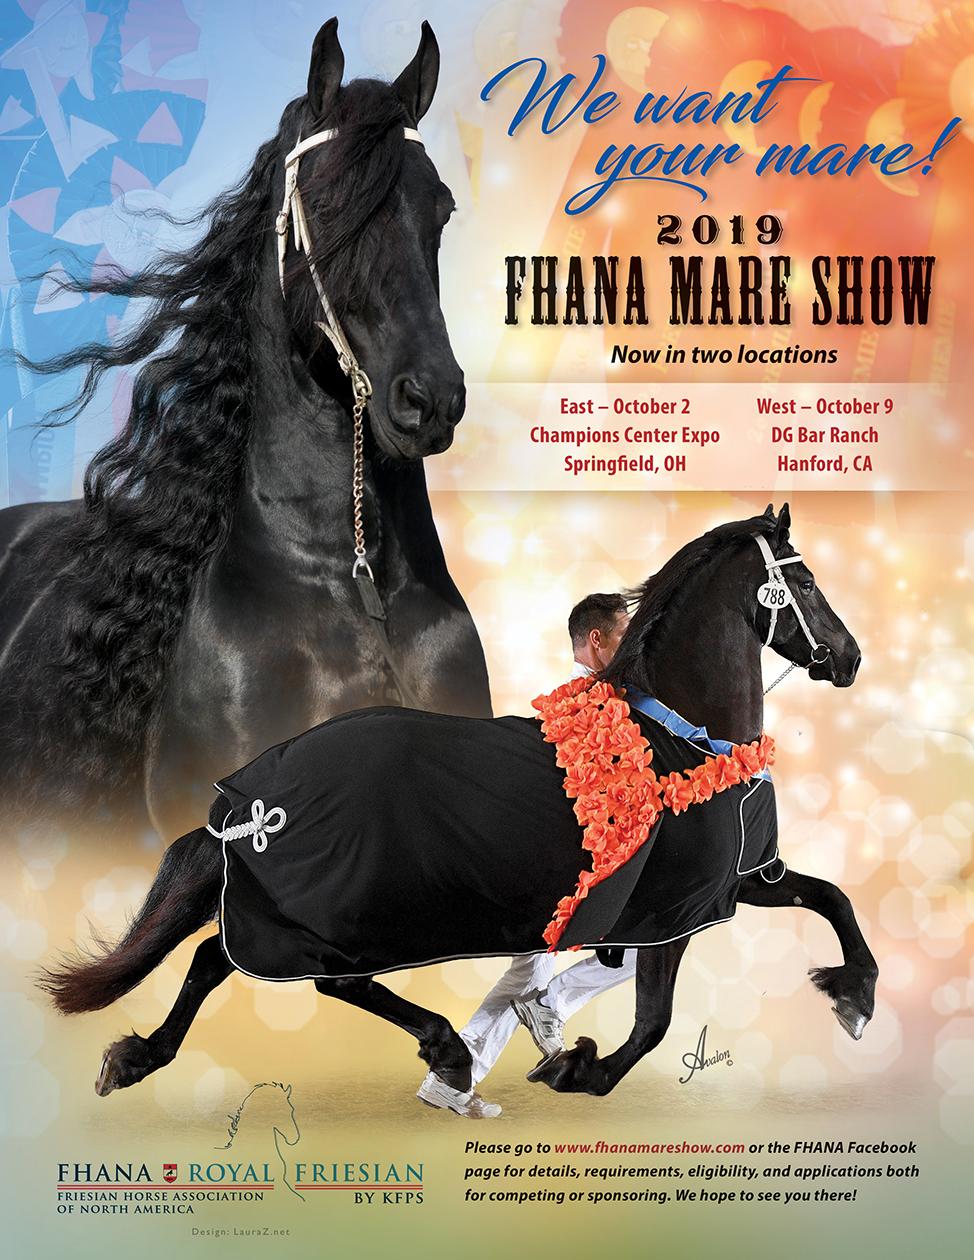 2019 FHANA Mare show ad.jpg